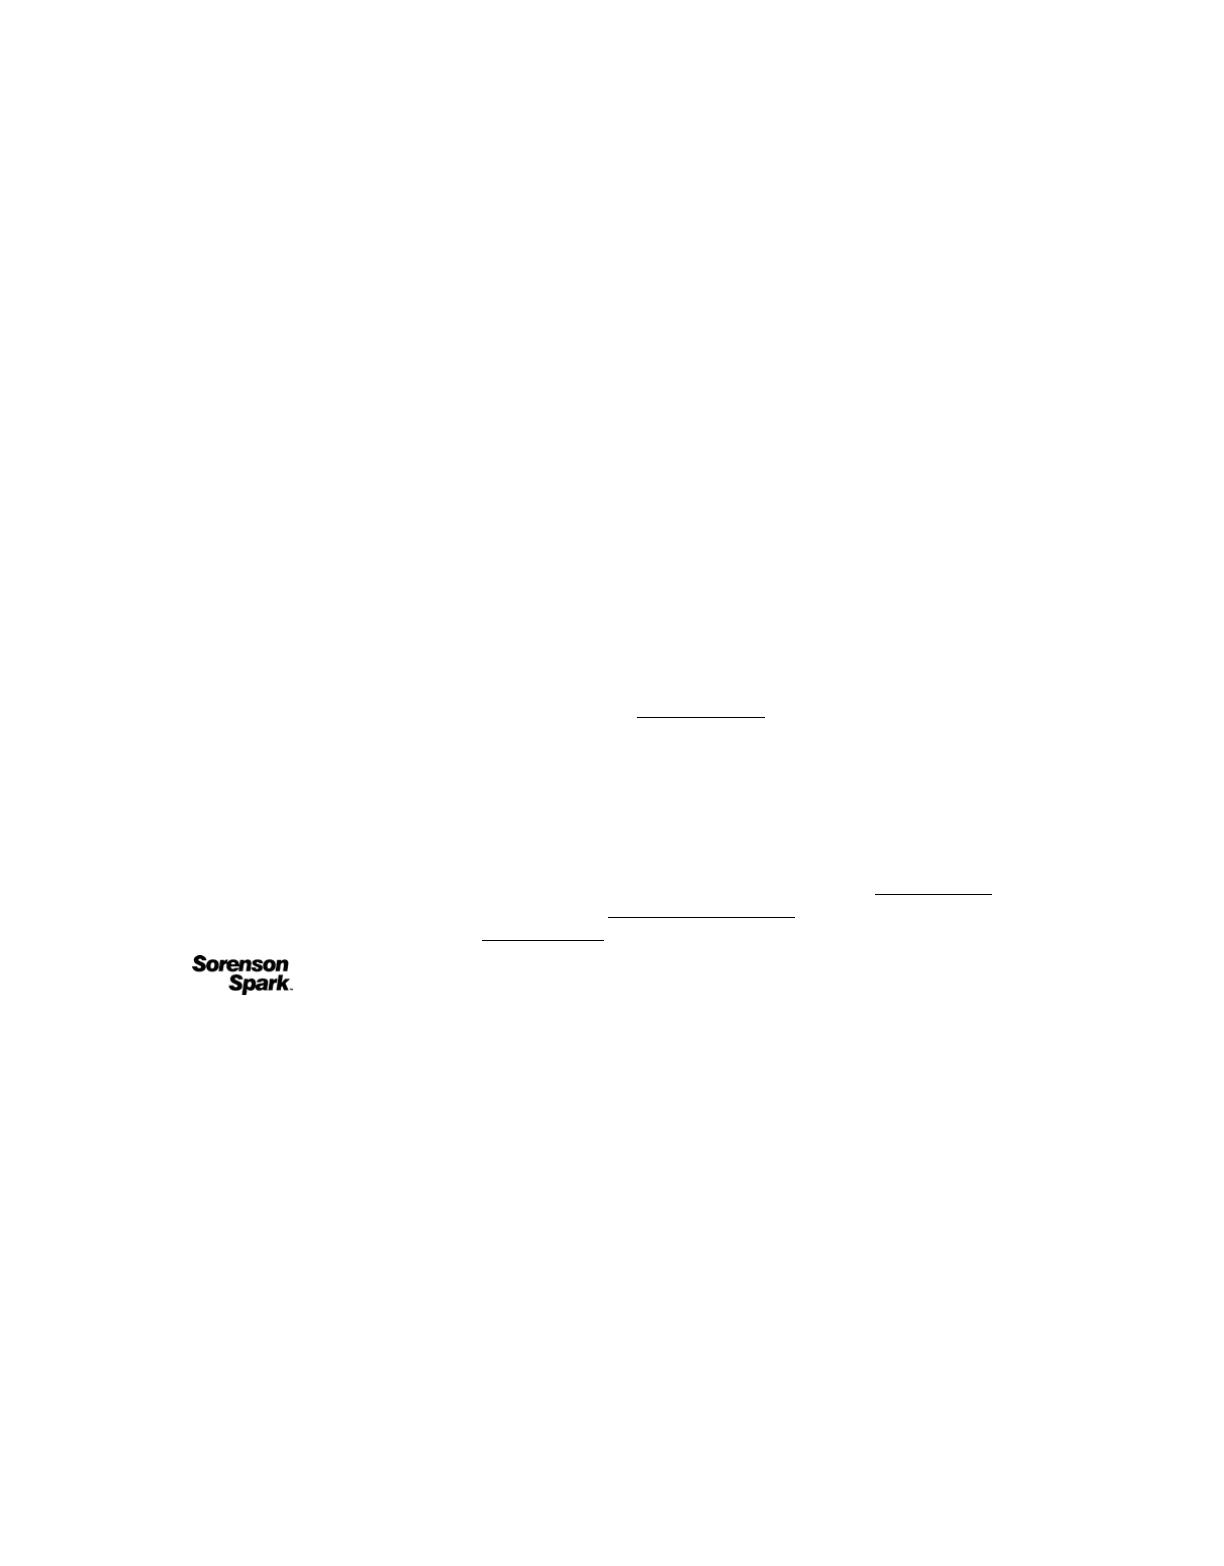 Handleiding Adobe ILLUSTRATOR CS4 (pagina 512 van 555) (Deutsch)